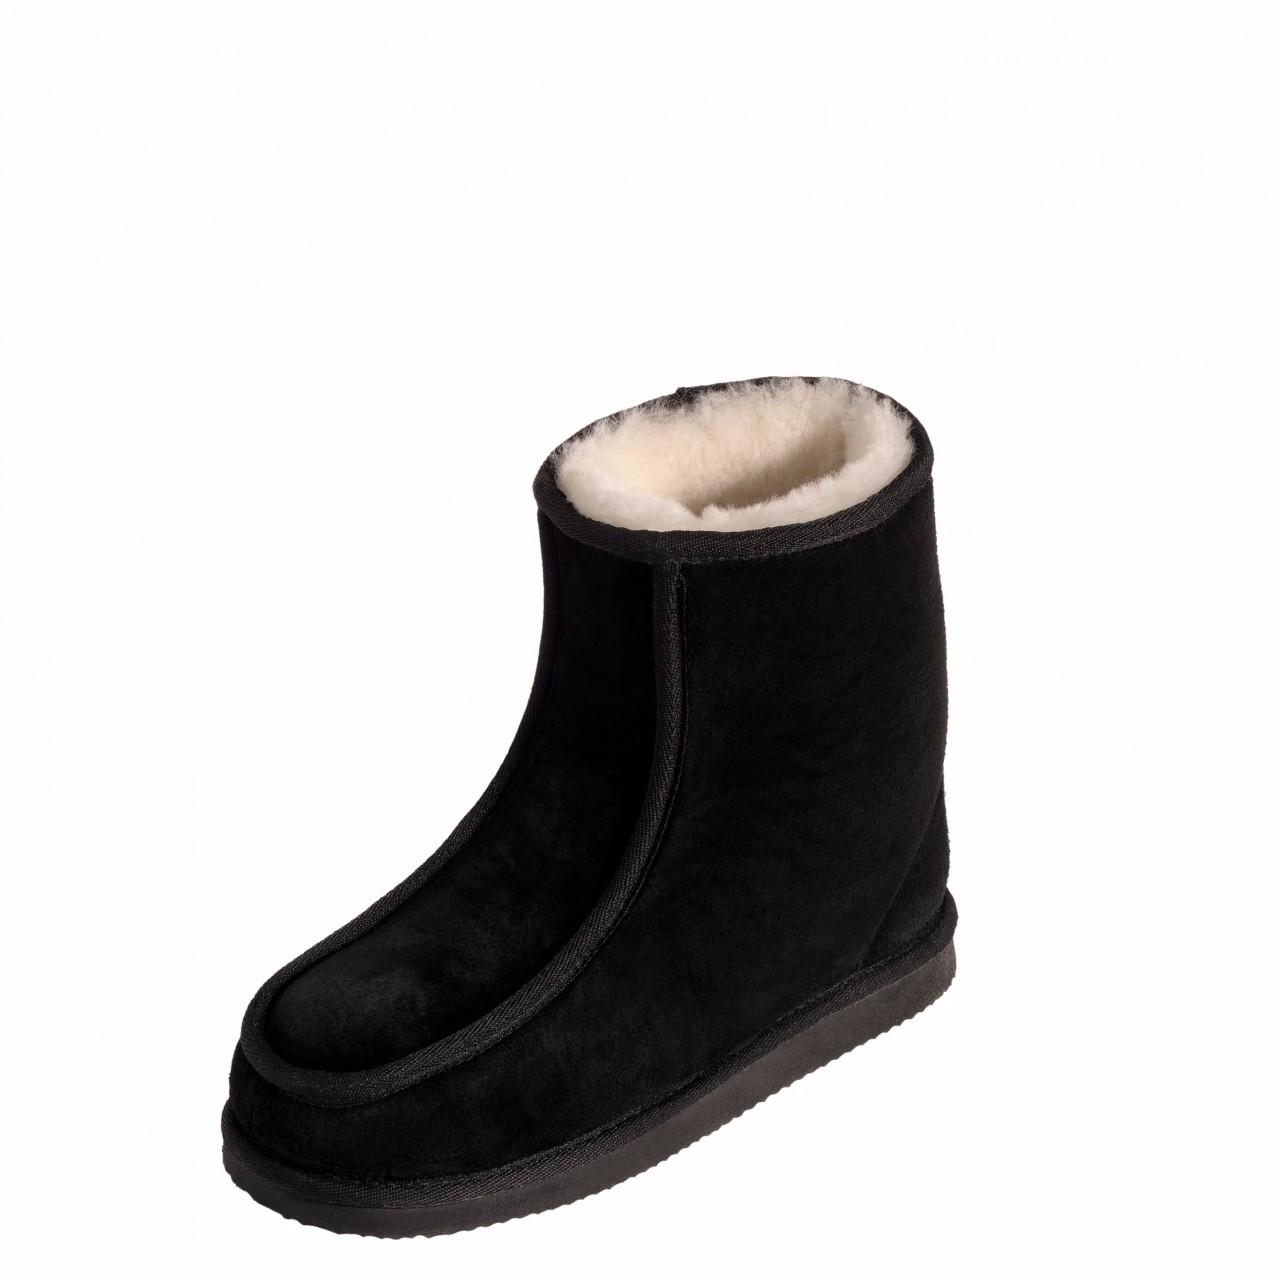 Mi Woollies Emu Ugg Boots / Slipper